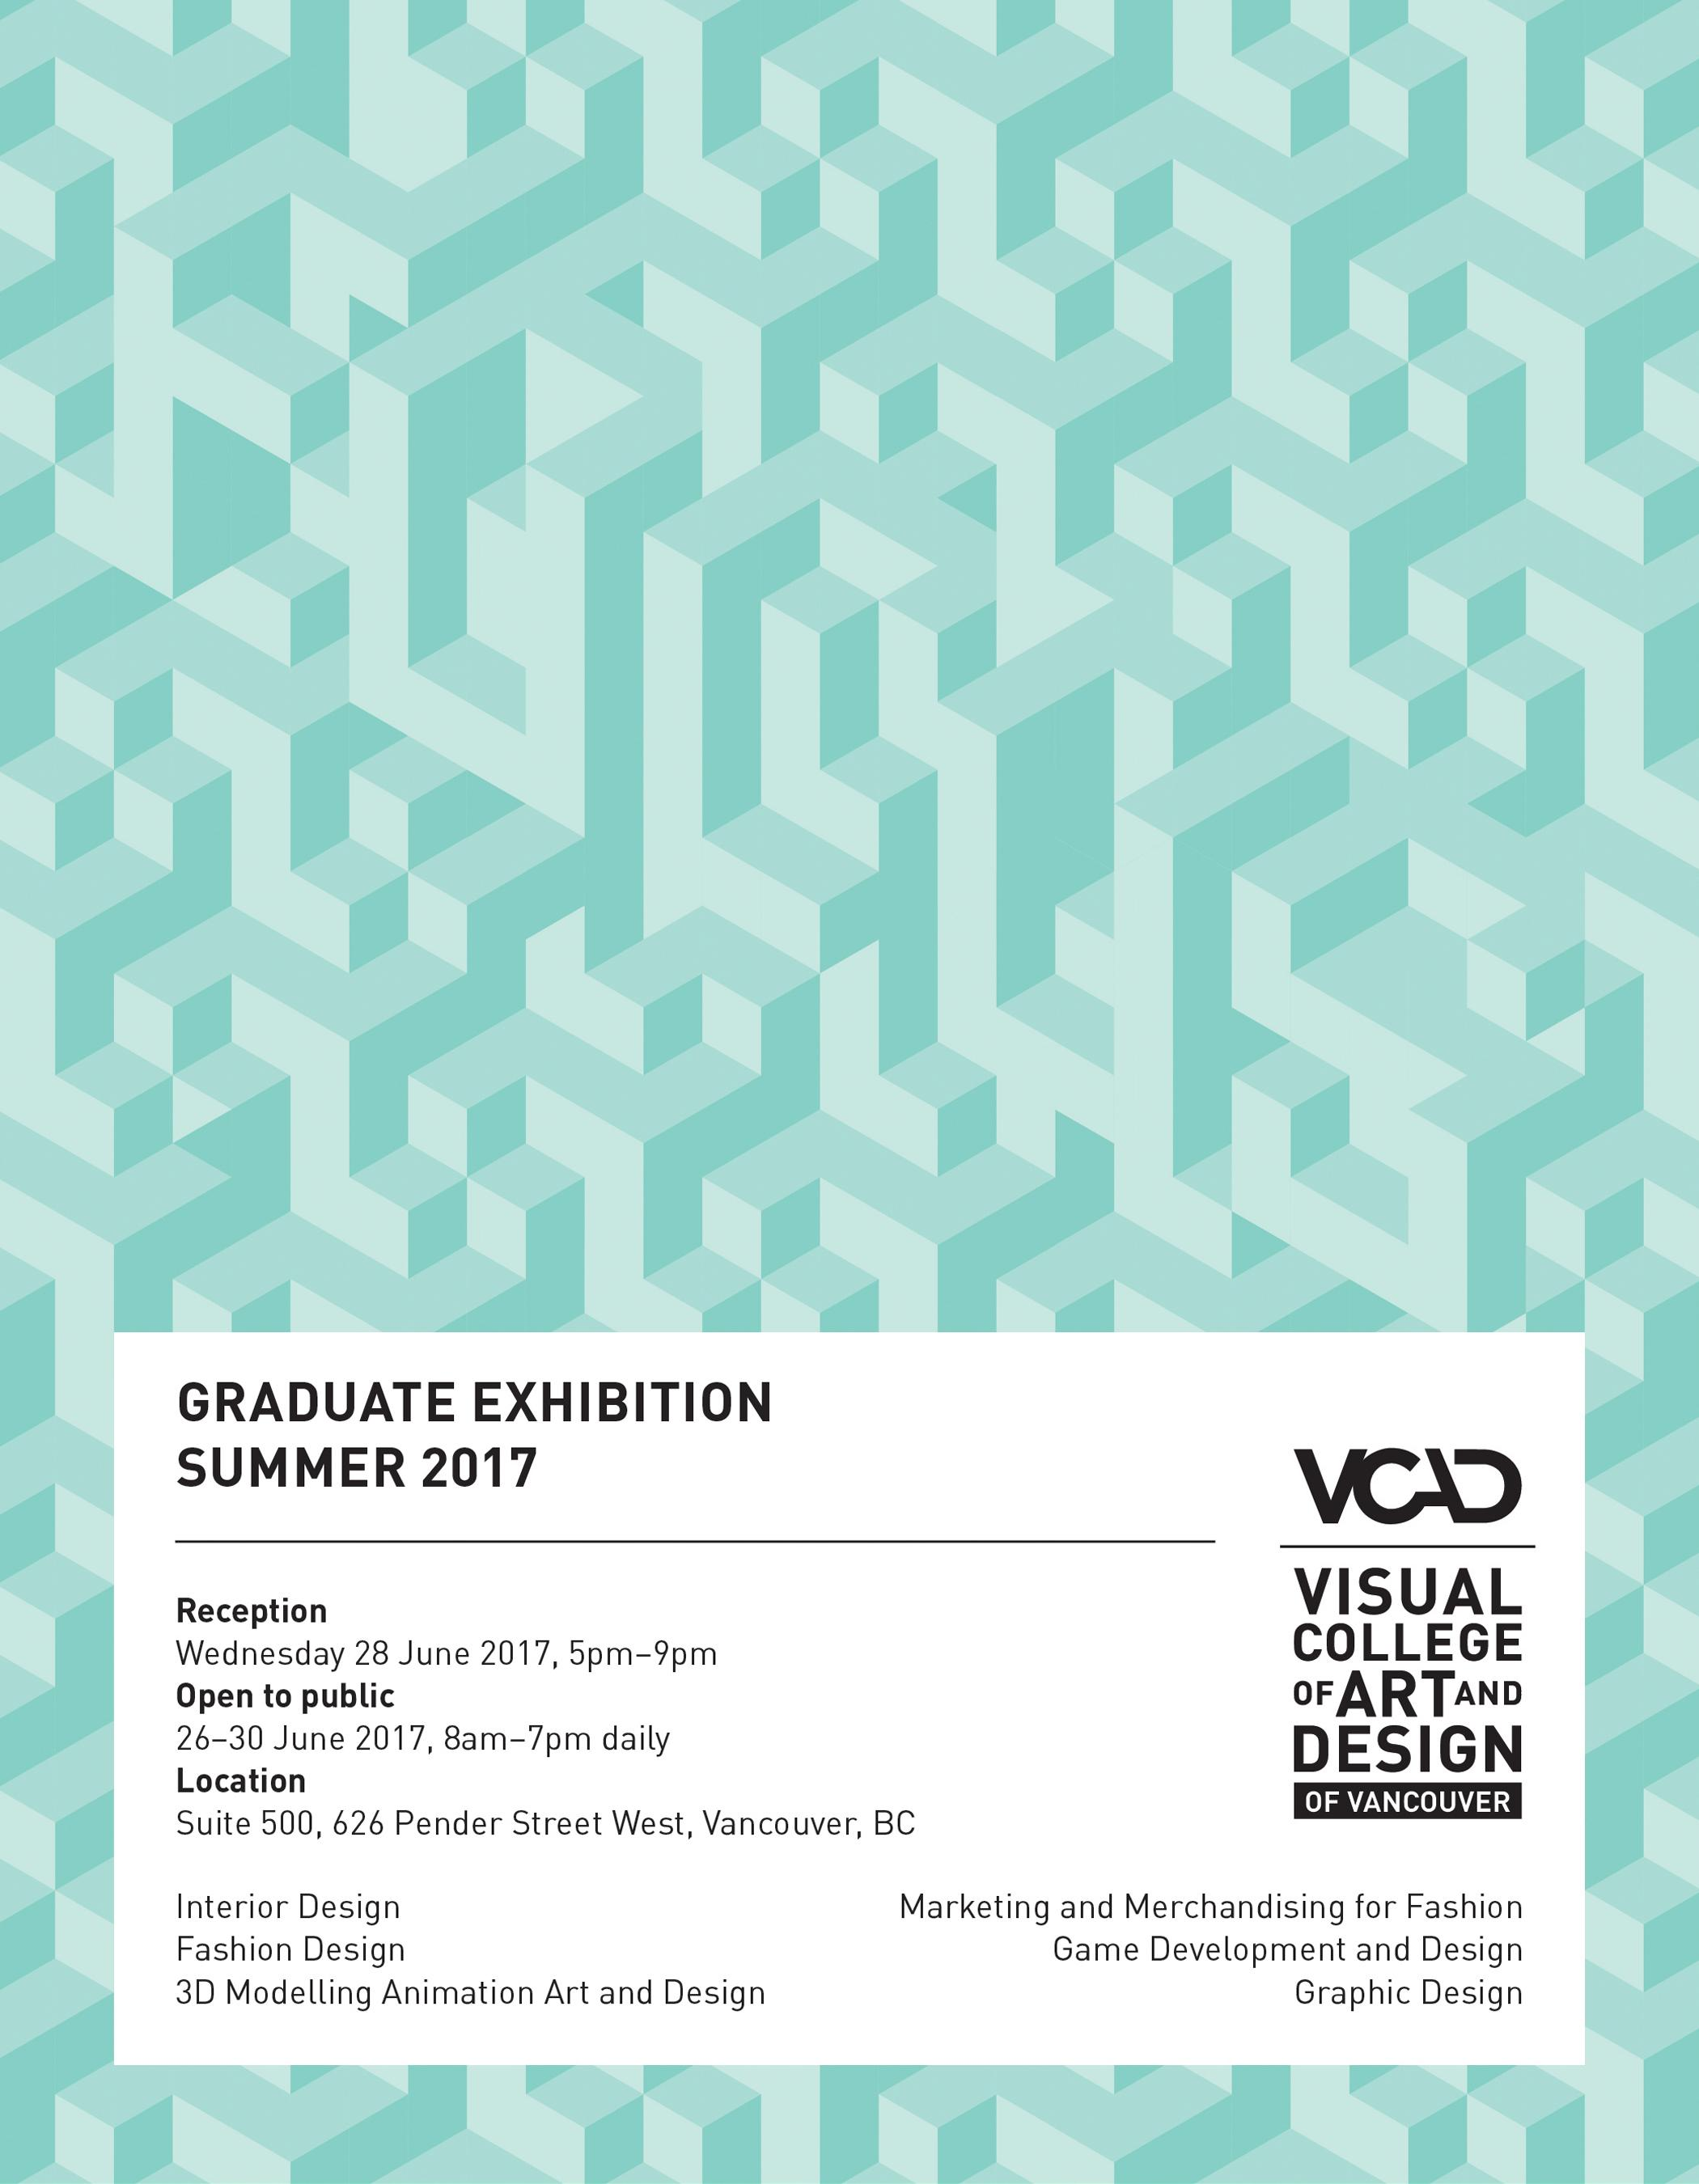 Graduation Exhibition Summer 2017